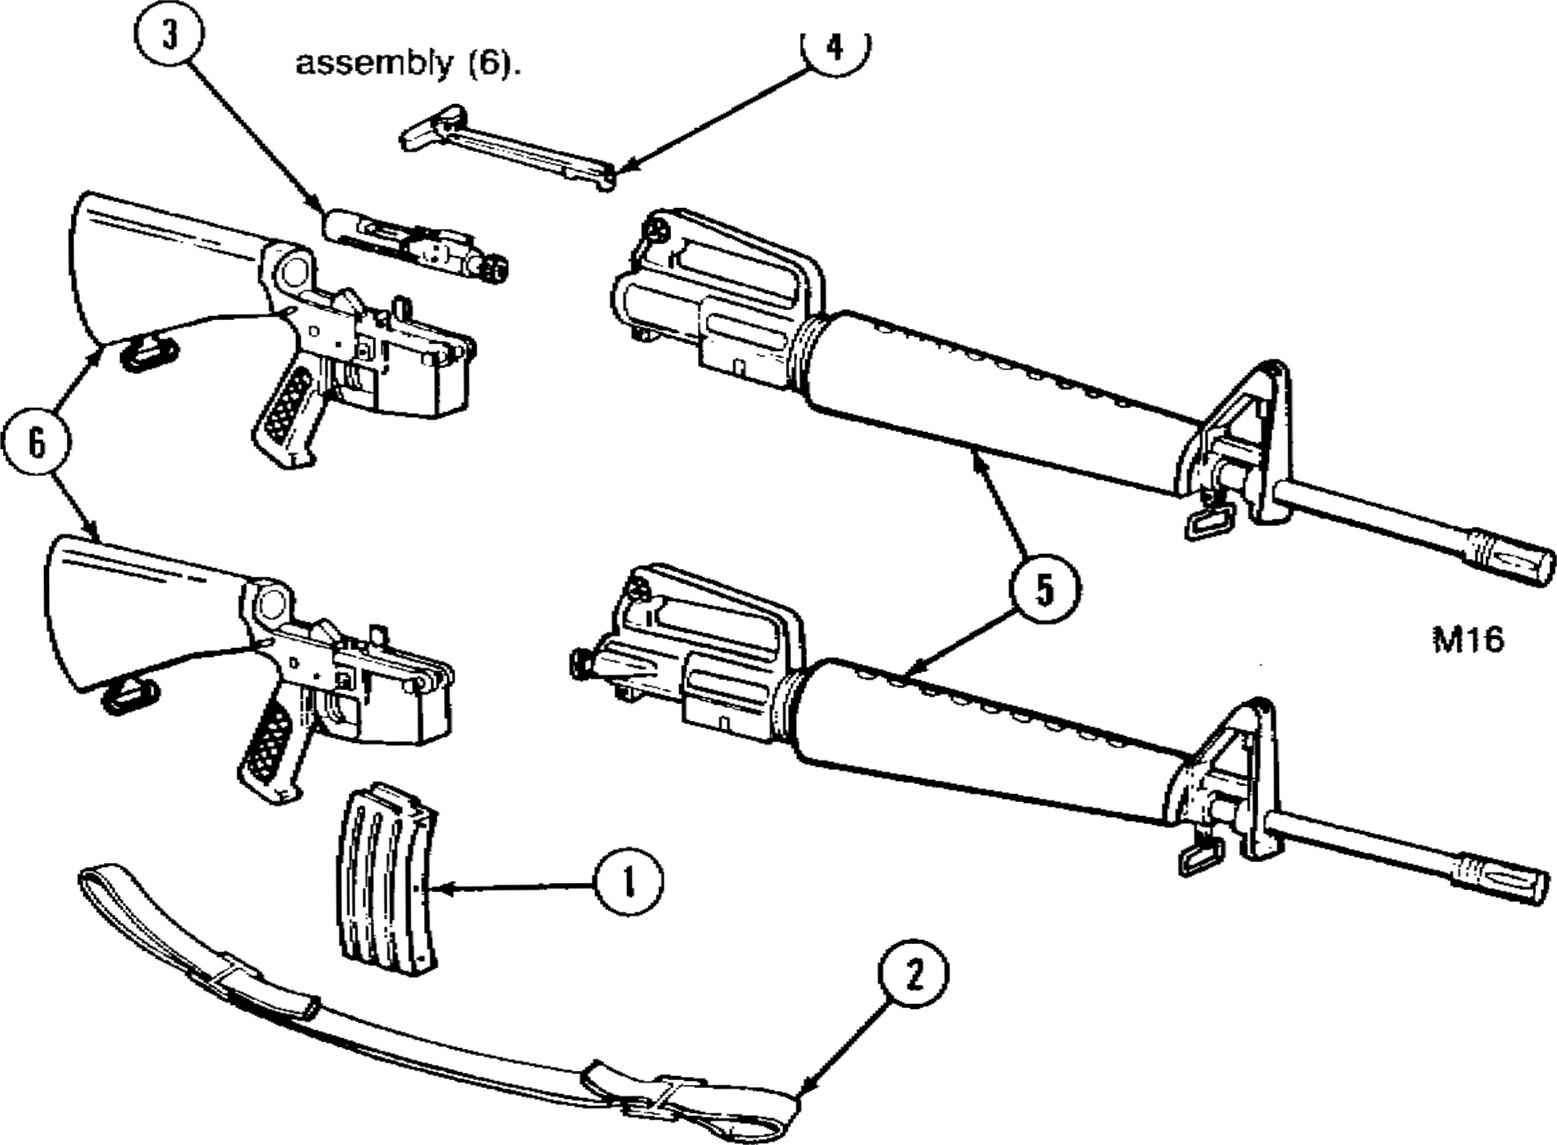 Major Components Of Ma Rifle